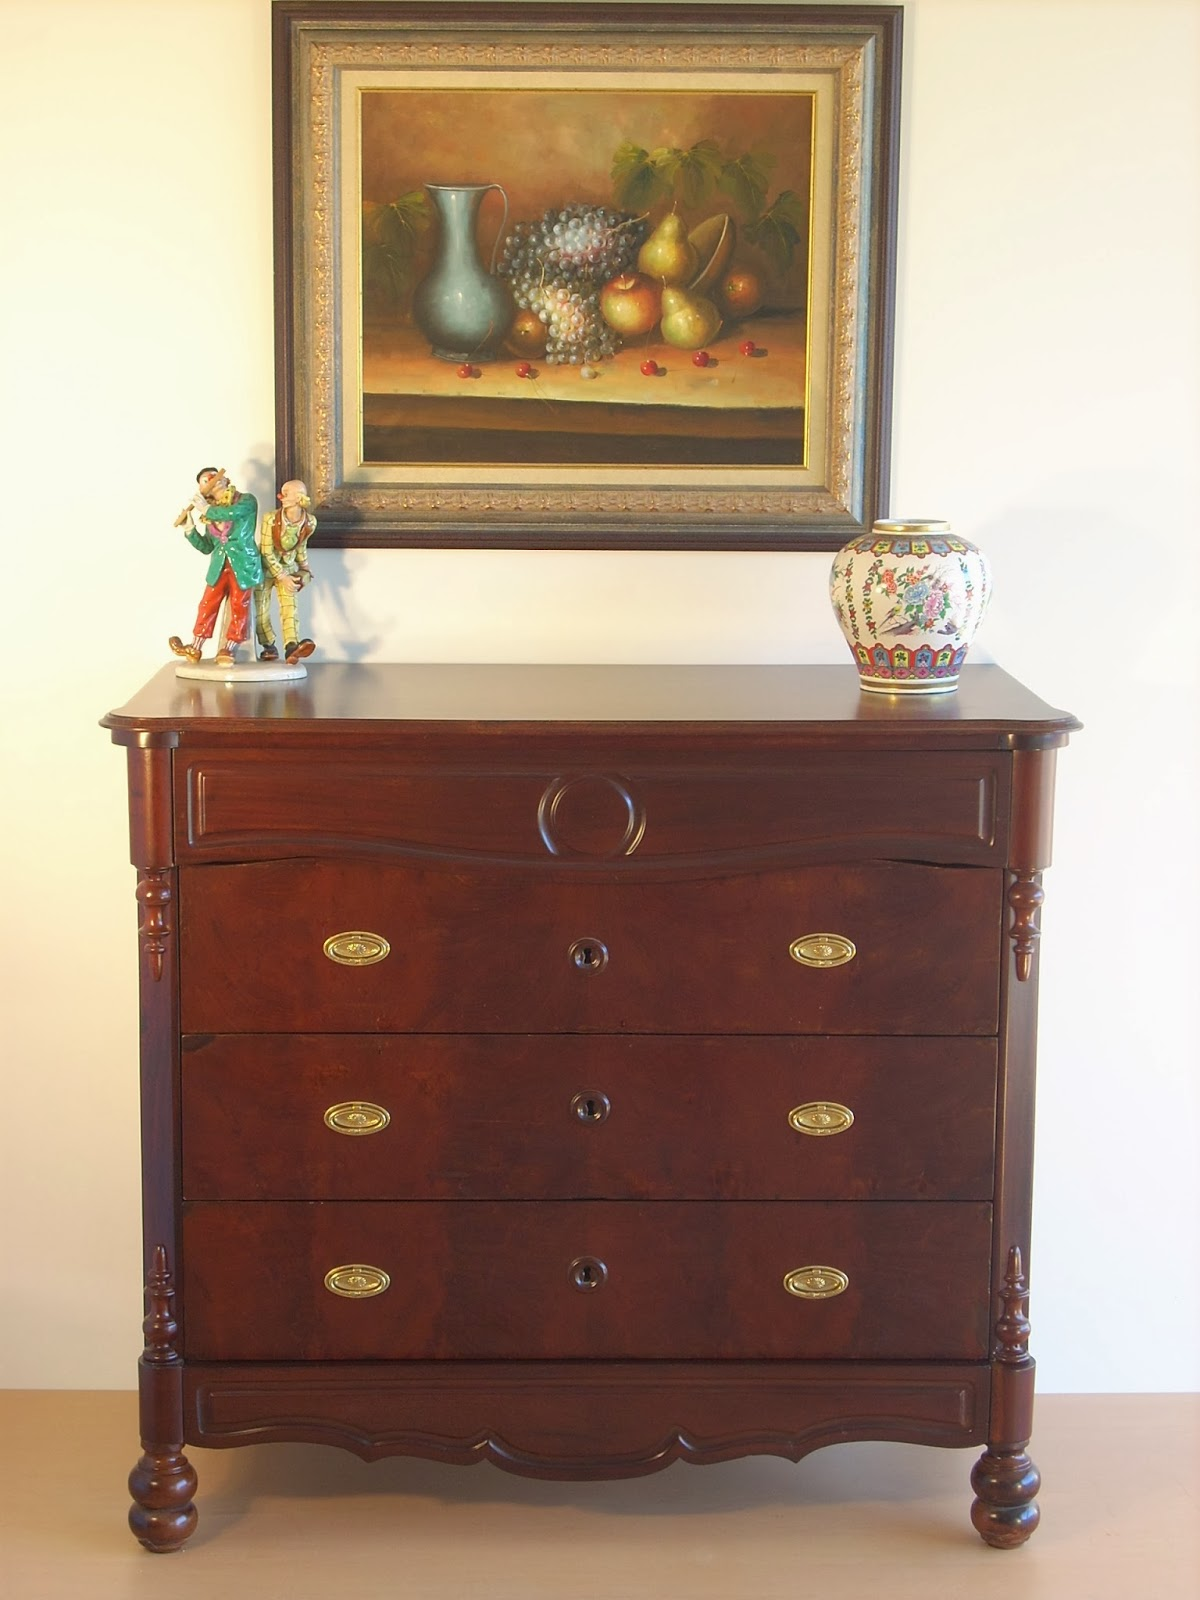 Tasador muebles antiguos obtenga ideas dise o de muebles - Fotos de muebles antiguos ...